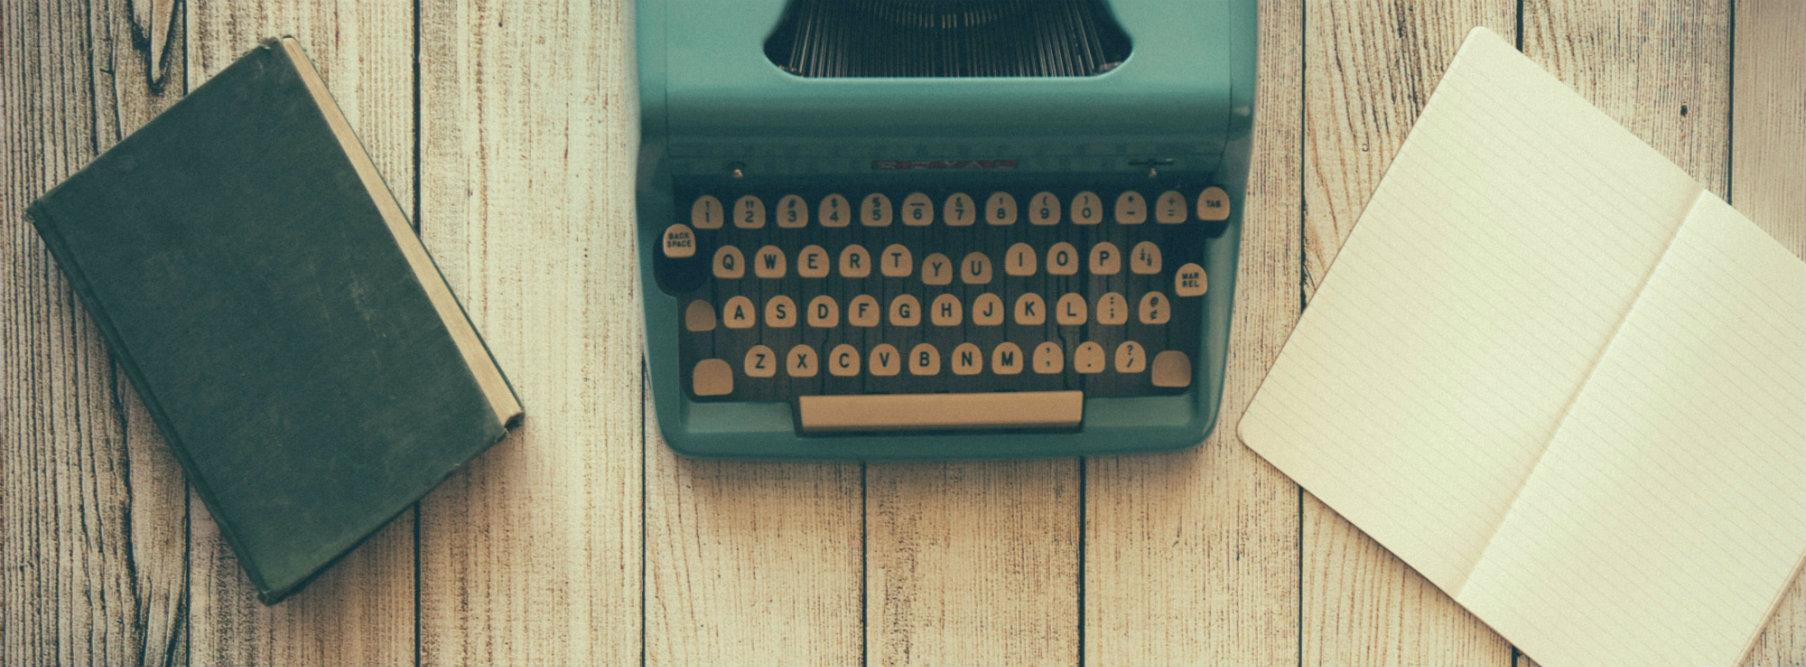 blogs-laten-schrijven